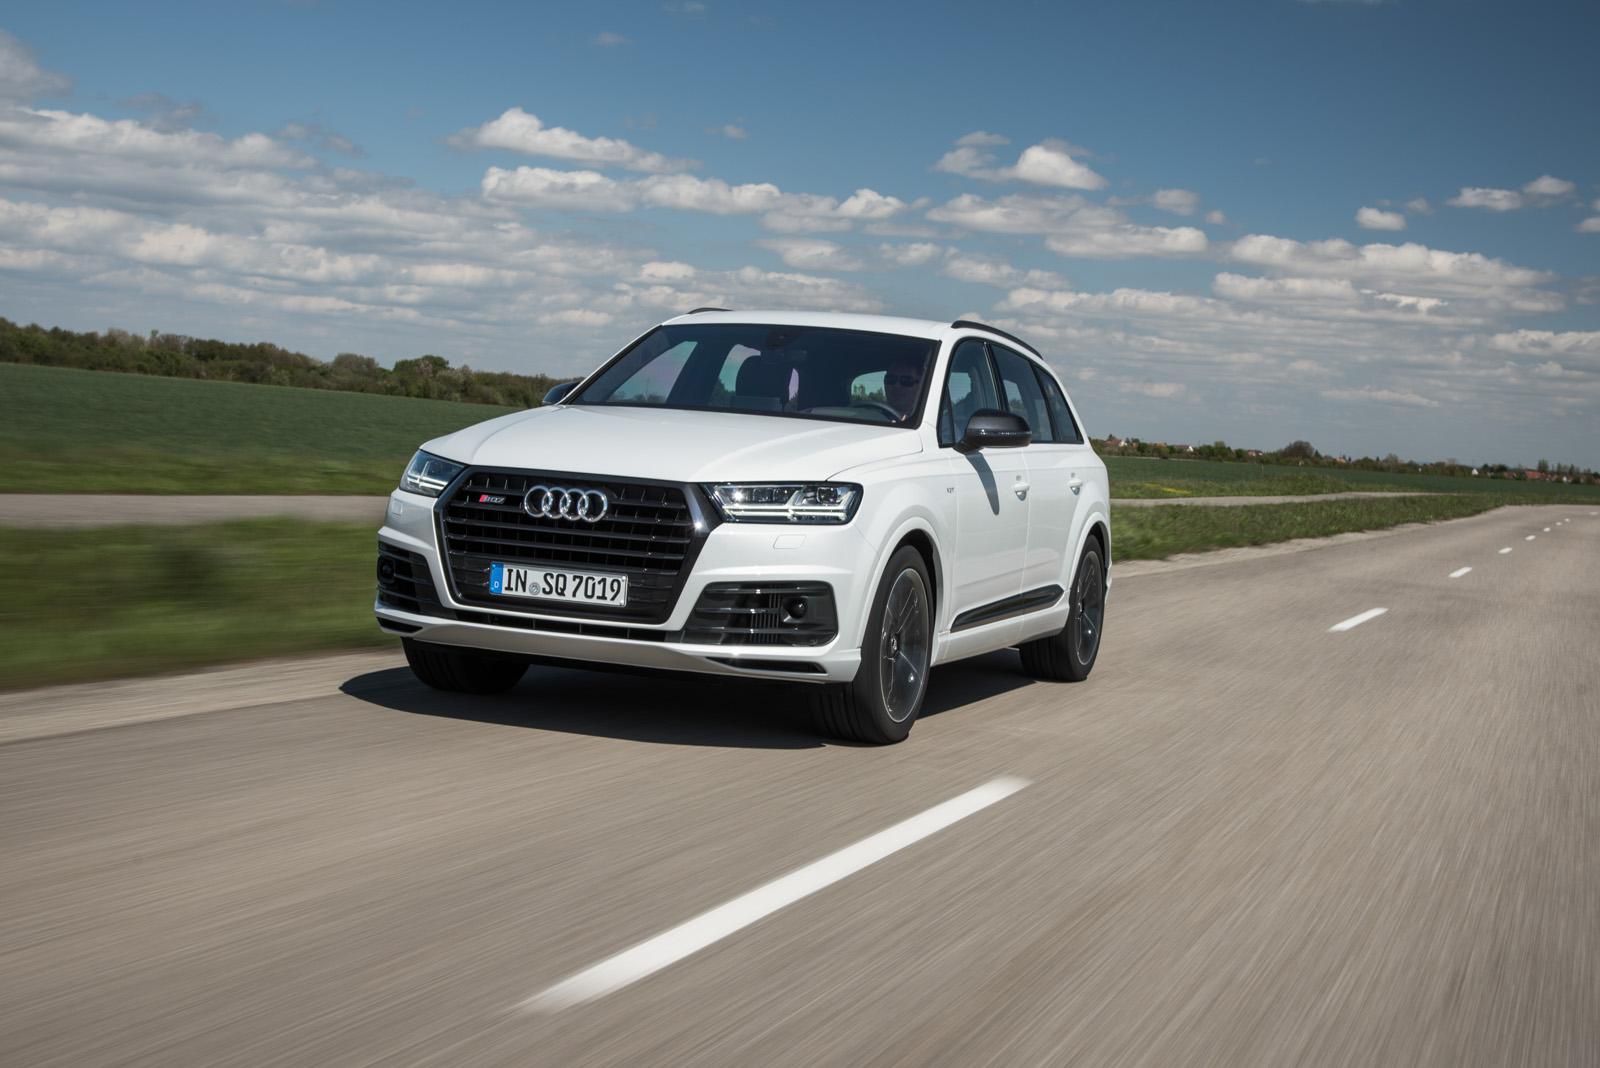 2017 Audi Sq7 Tdi Review Gtspirit